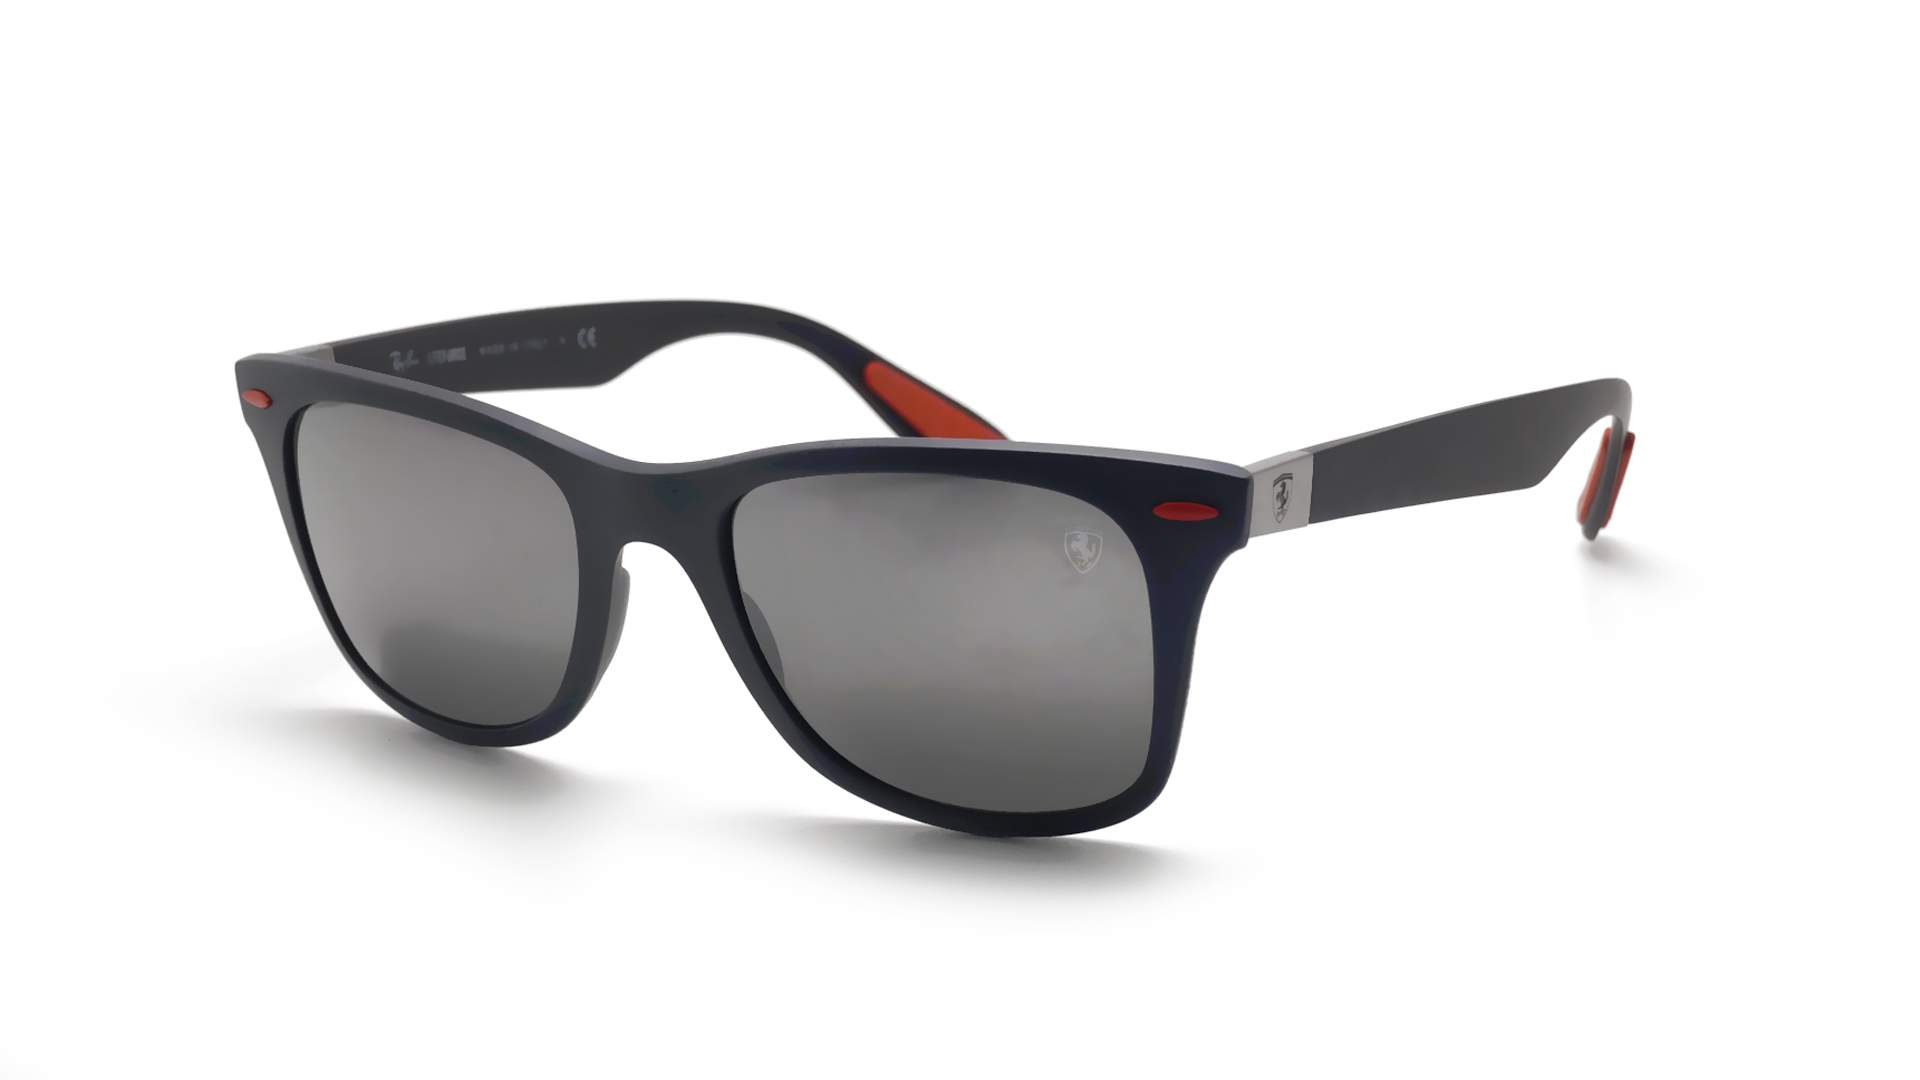 b7042fcc05 Sunglasses Ray-Ban Wayfarer Scuderia Ferrari Grey Matte RB4195M F605 6G  52-20 Medium Mirror